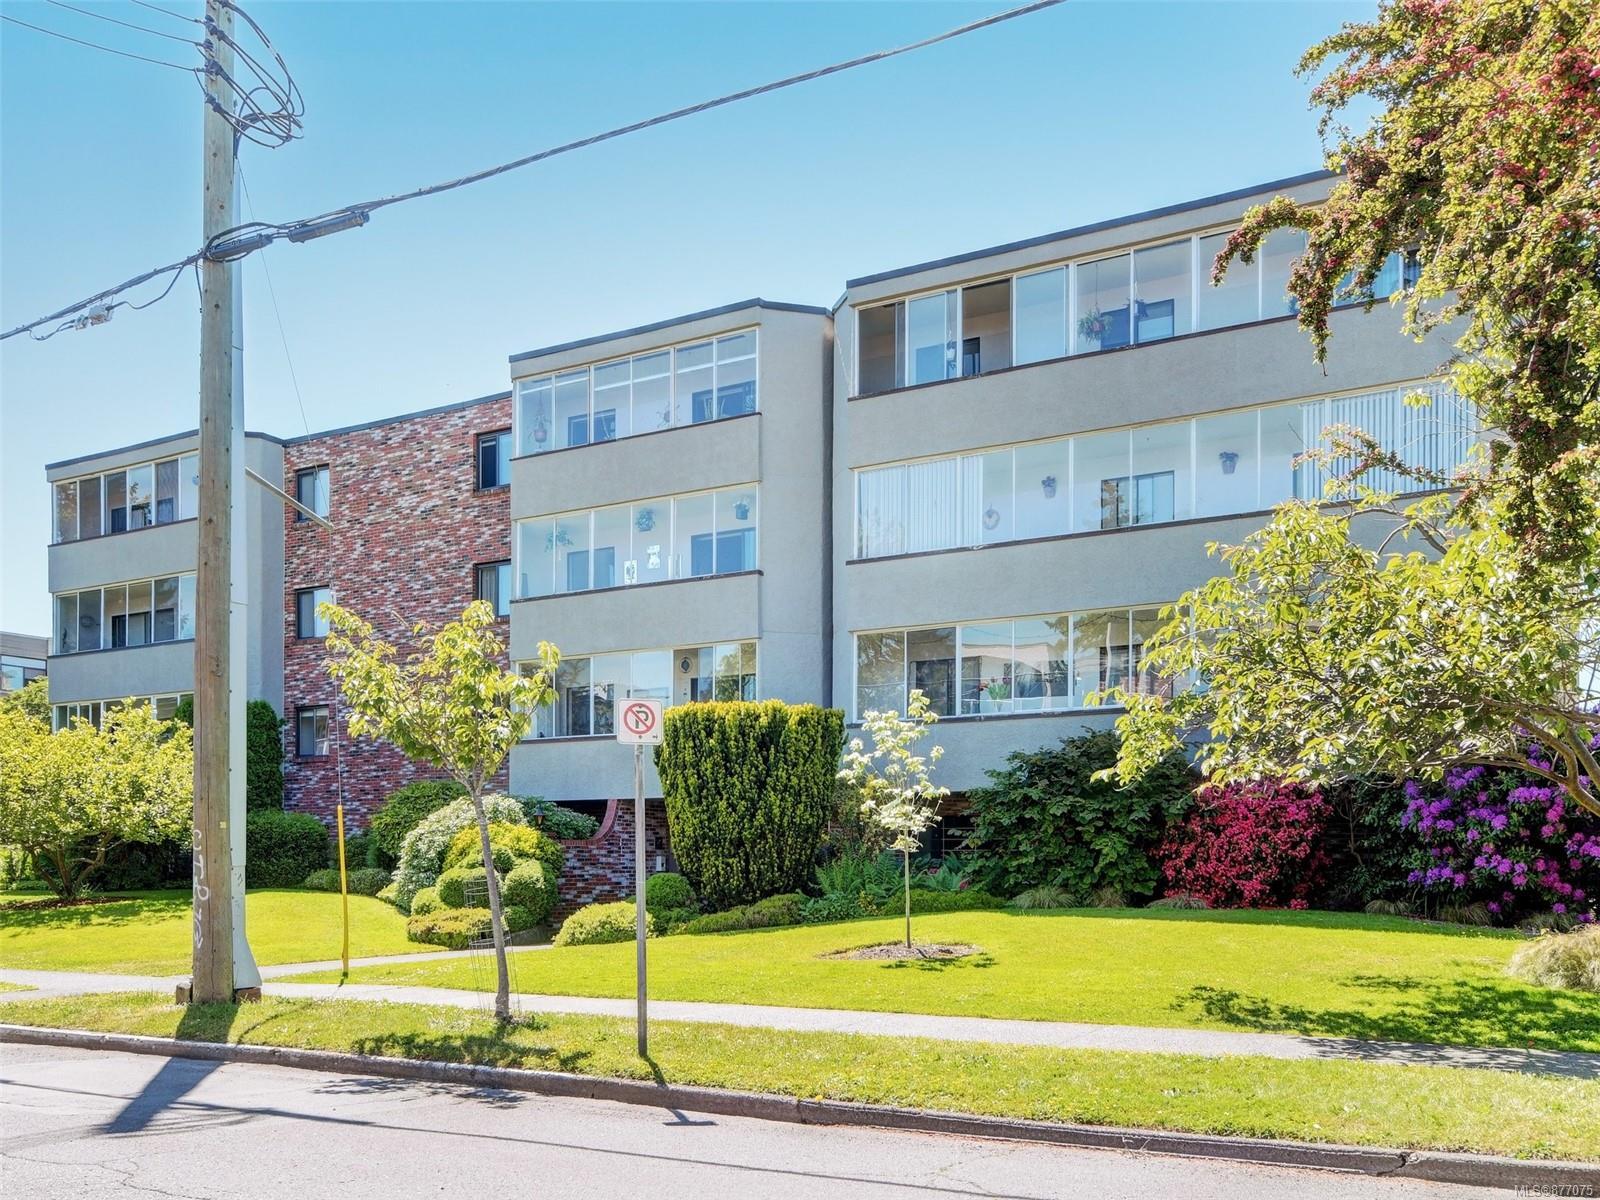 201 - 1041 Rockland Street, Rockland, Victoria